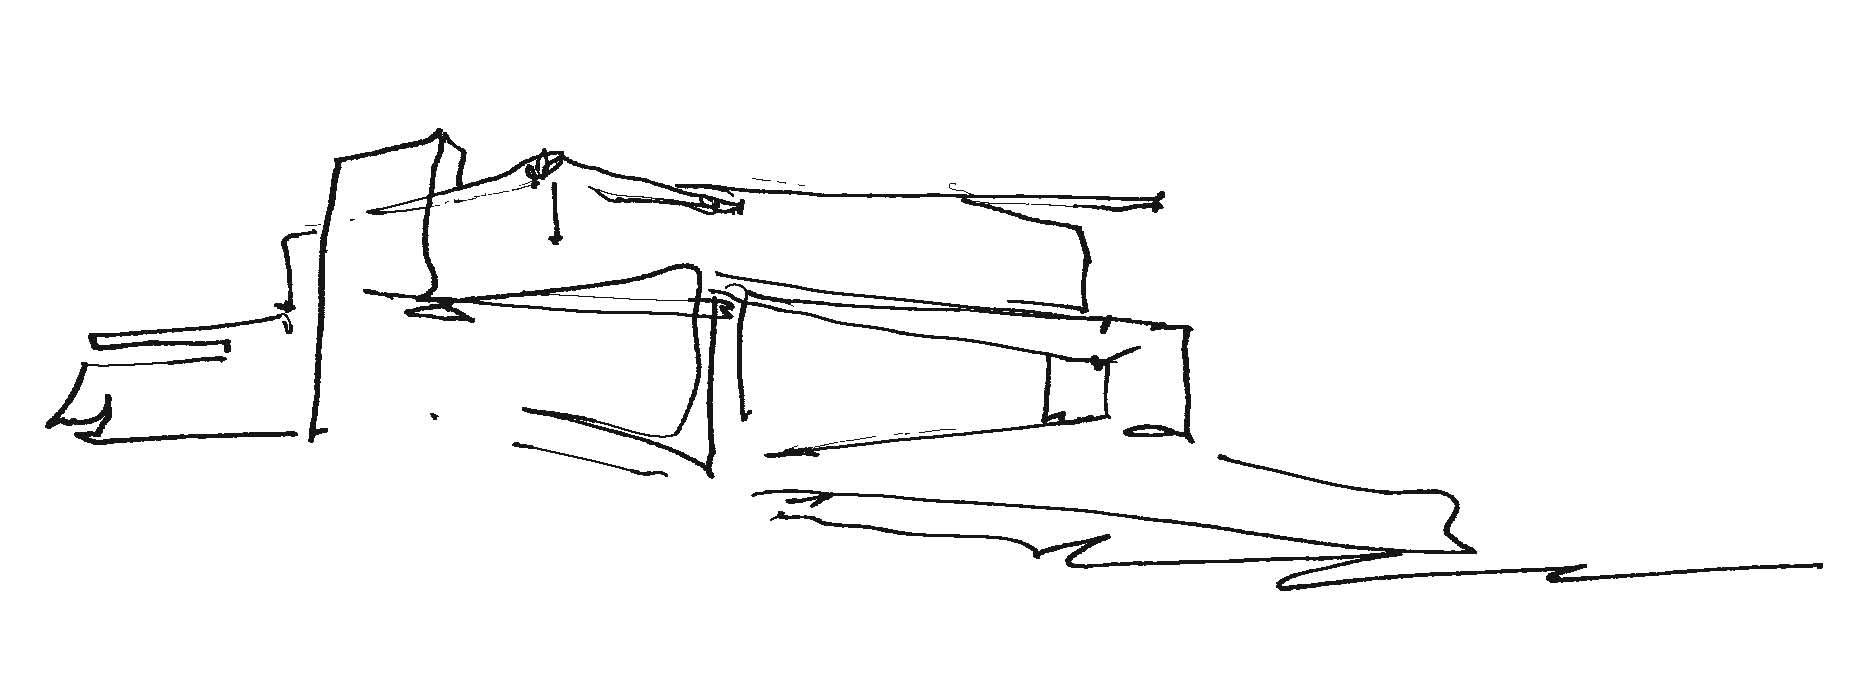 dma-hand-sketch-signaturejpg